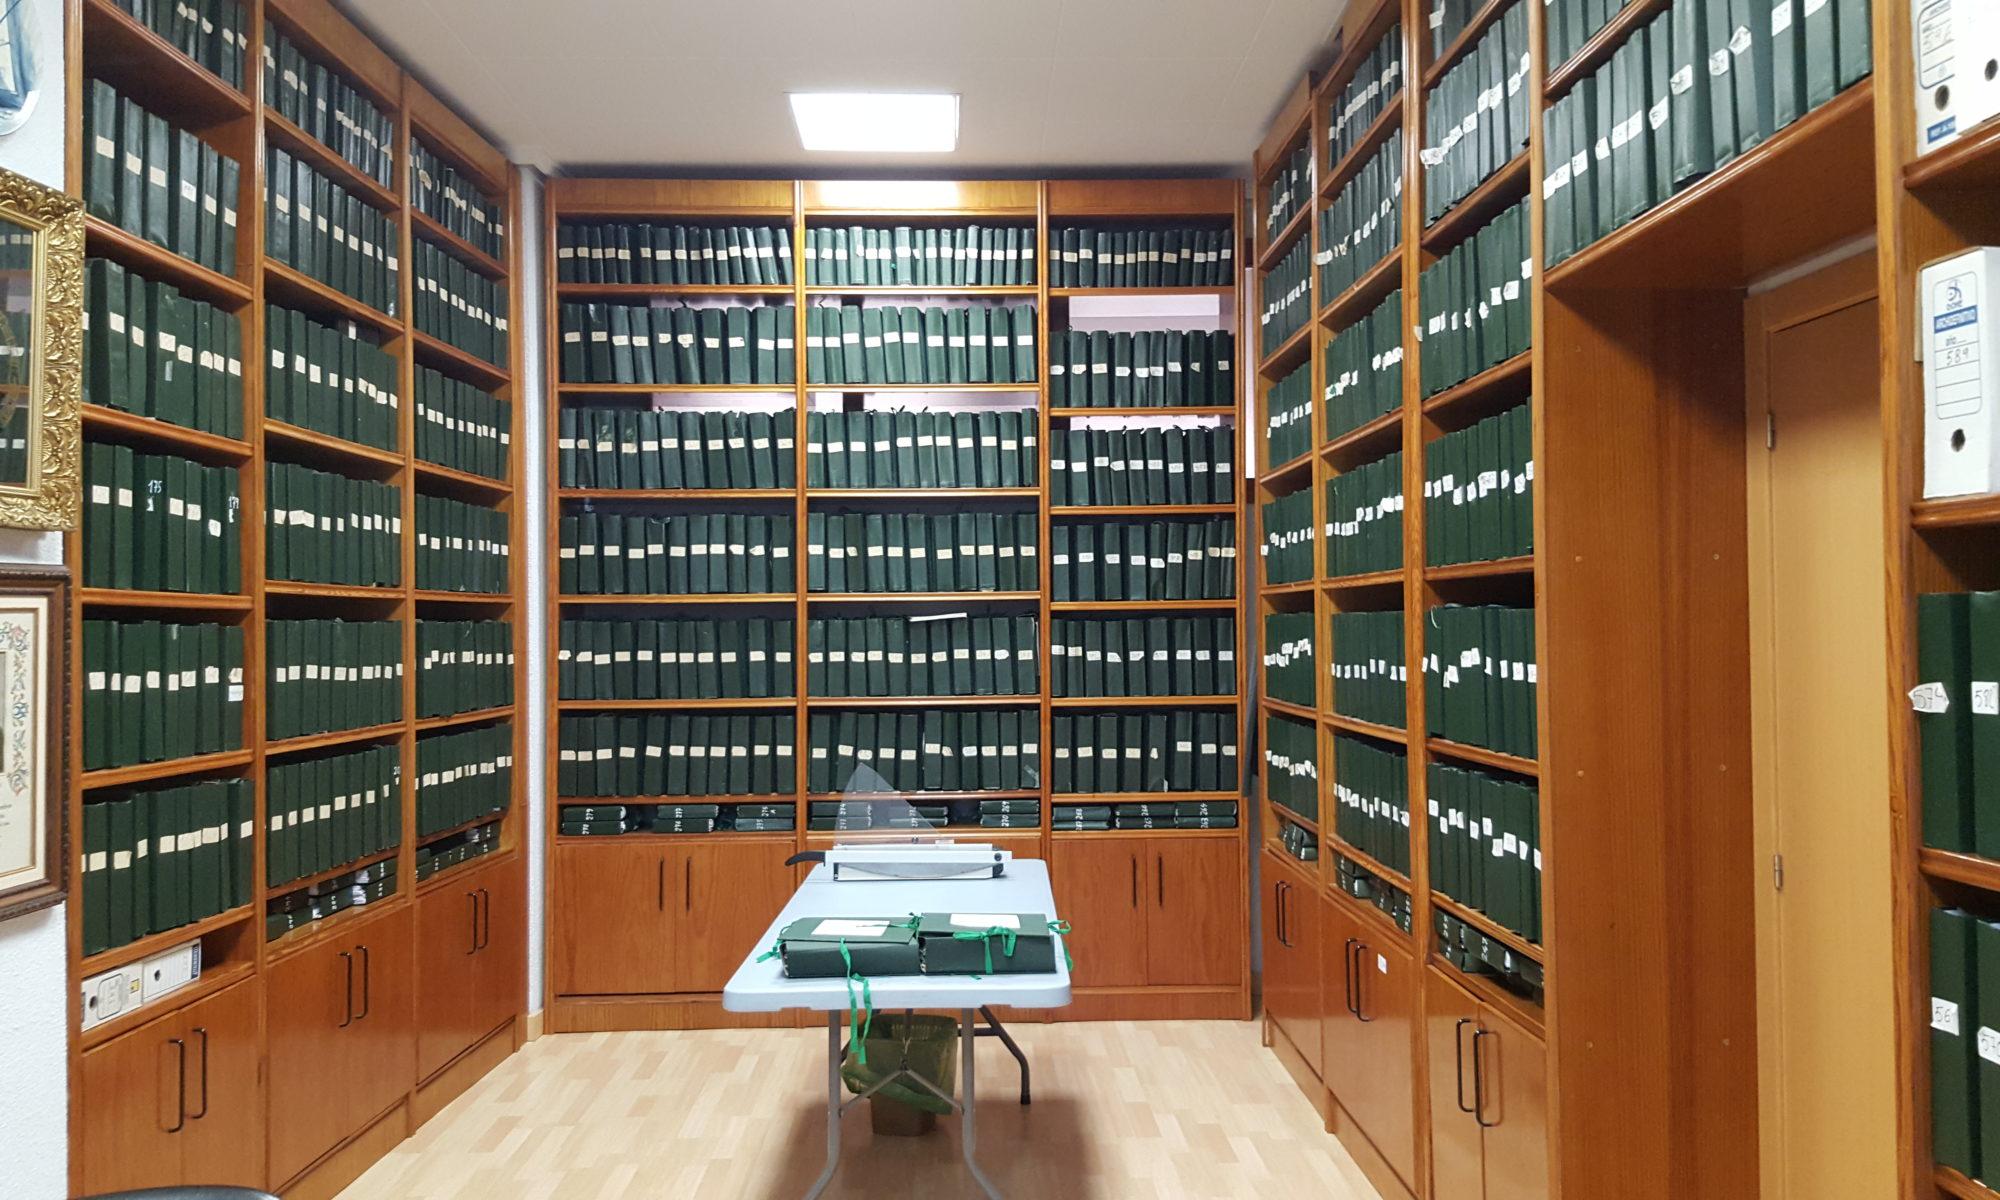 Arxiu de La Primitiva de Lliria